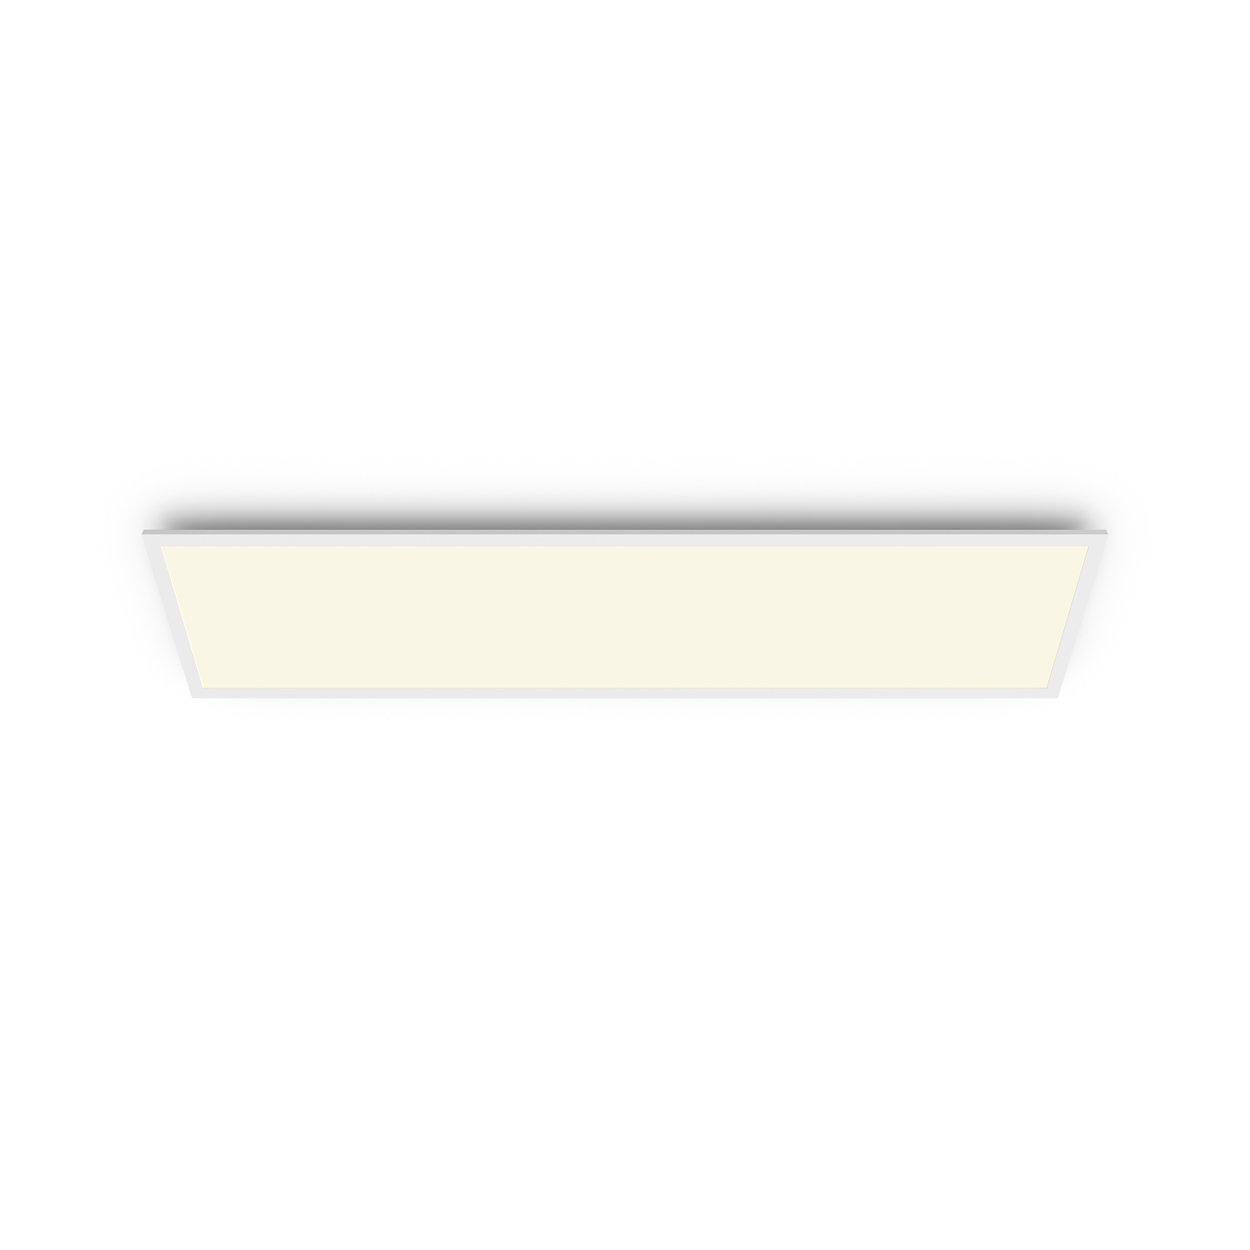 Das LED-Panel mit Dimmfunktion ohne Dimmer